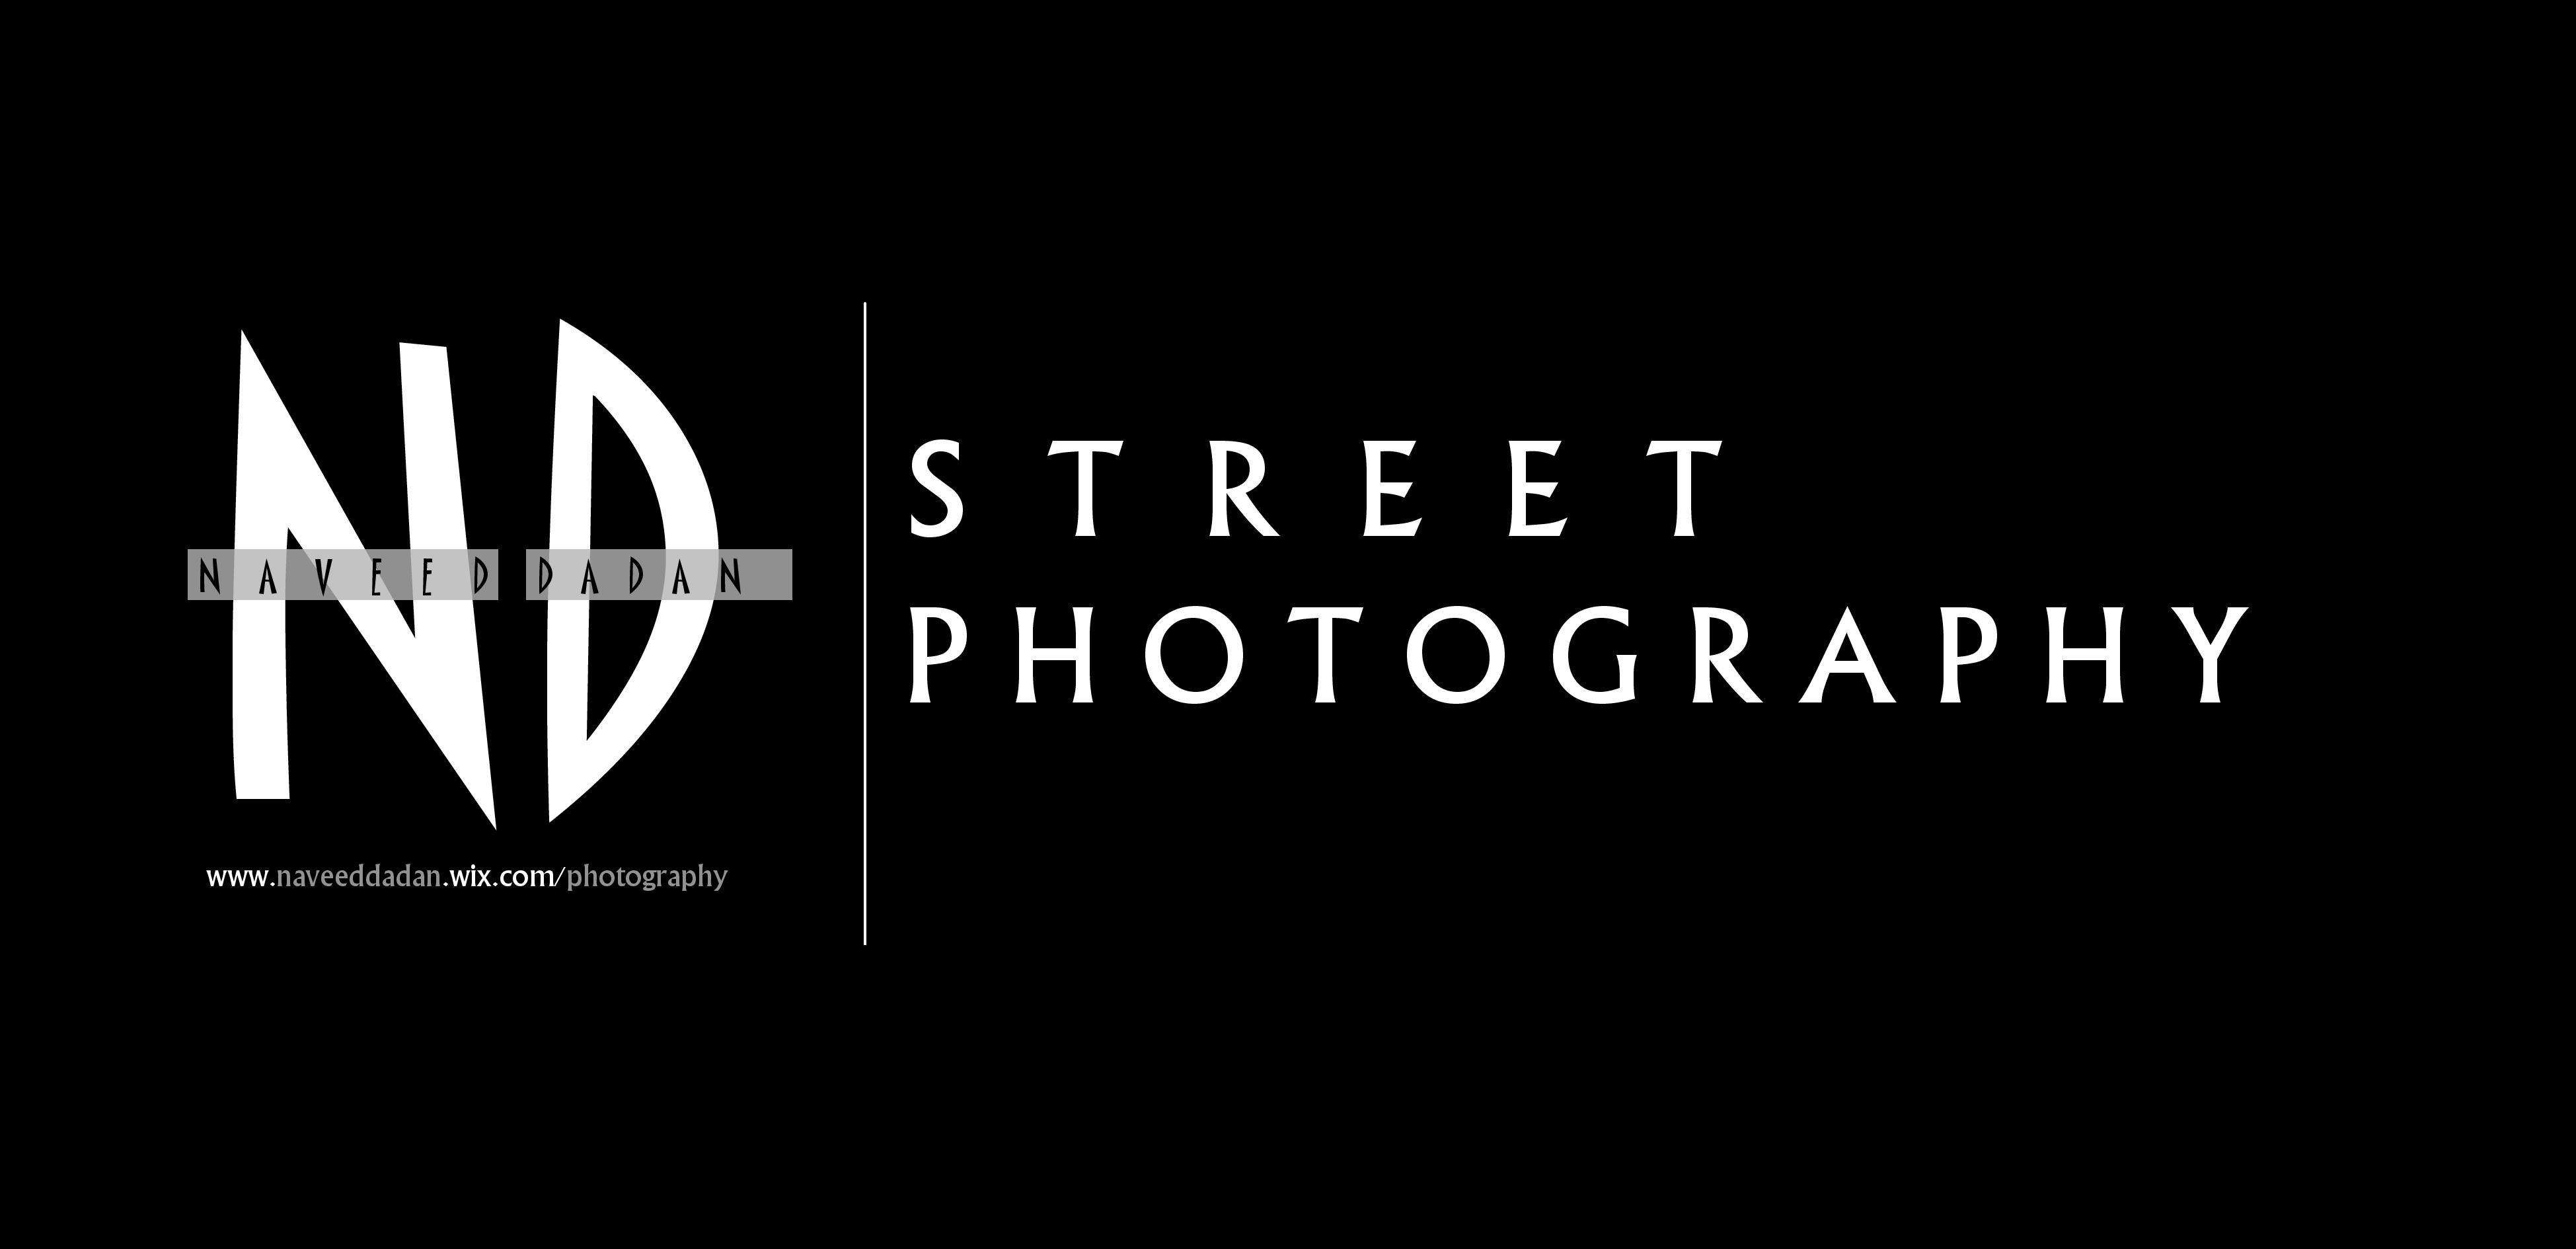 Naveed Dadan Street Photographer